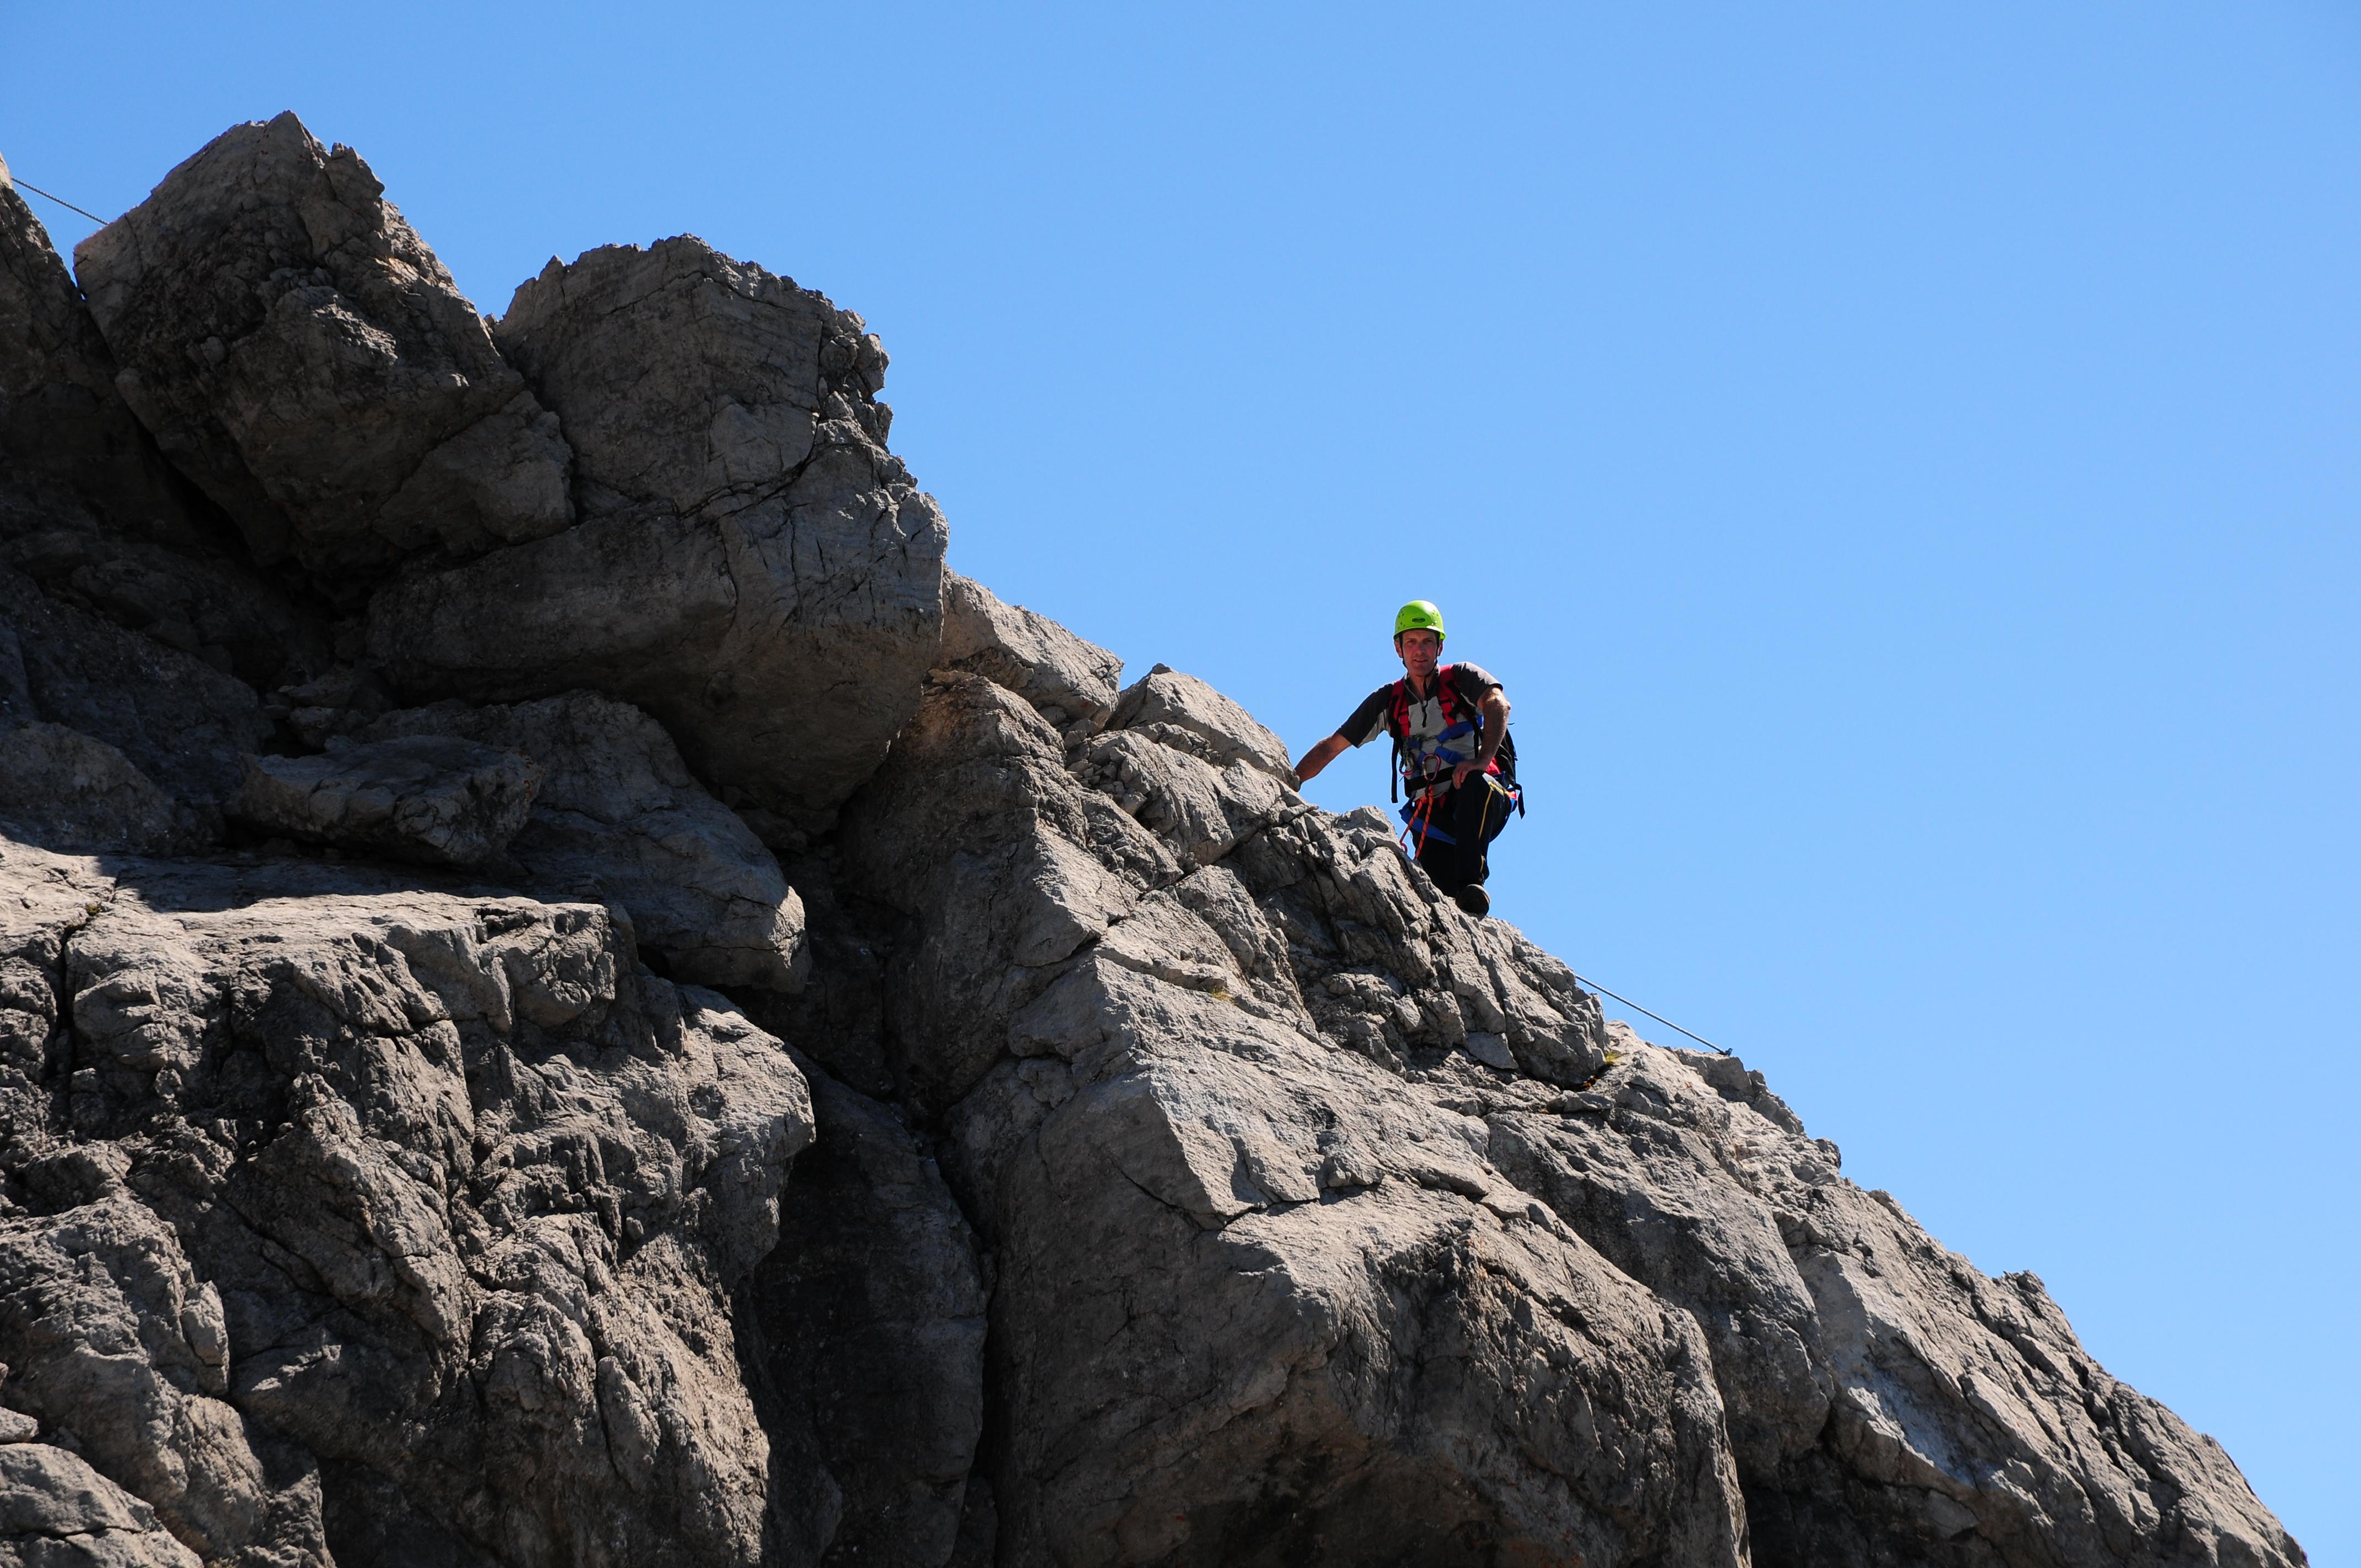 Klettersteig Saulakopf : File saulakopf klettersteig g wikimedia commons